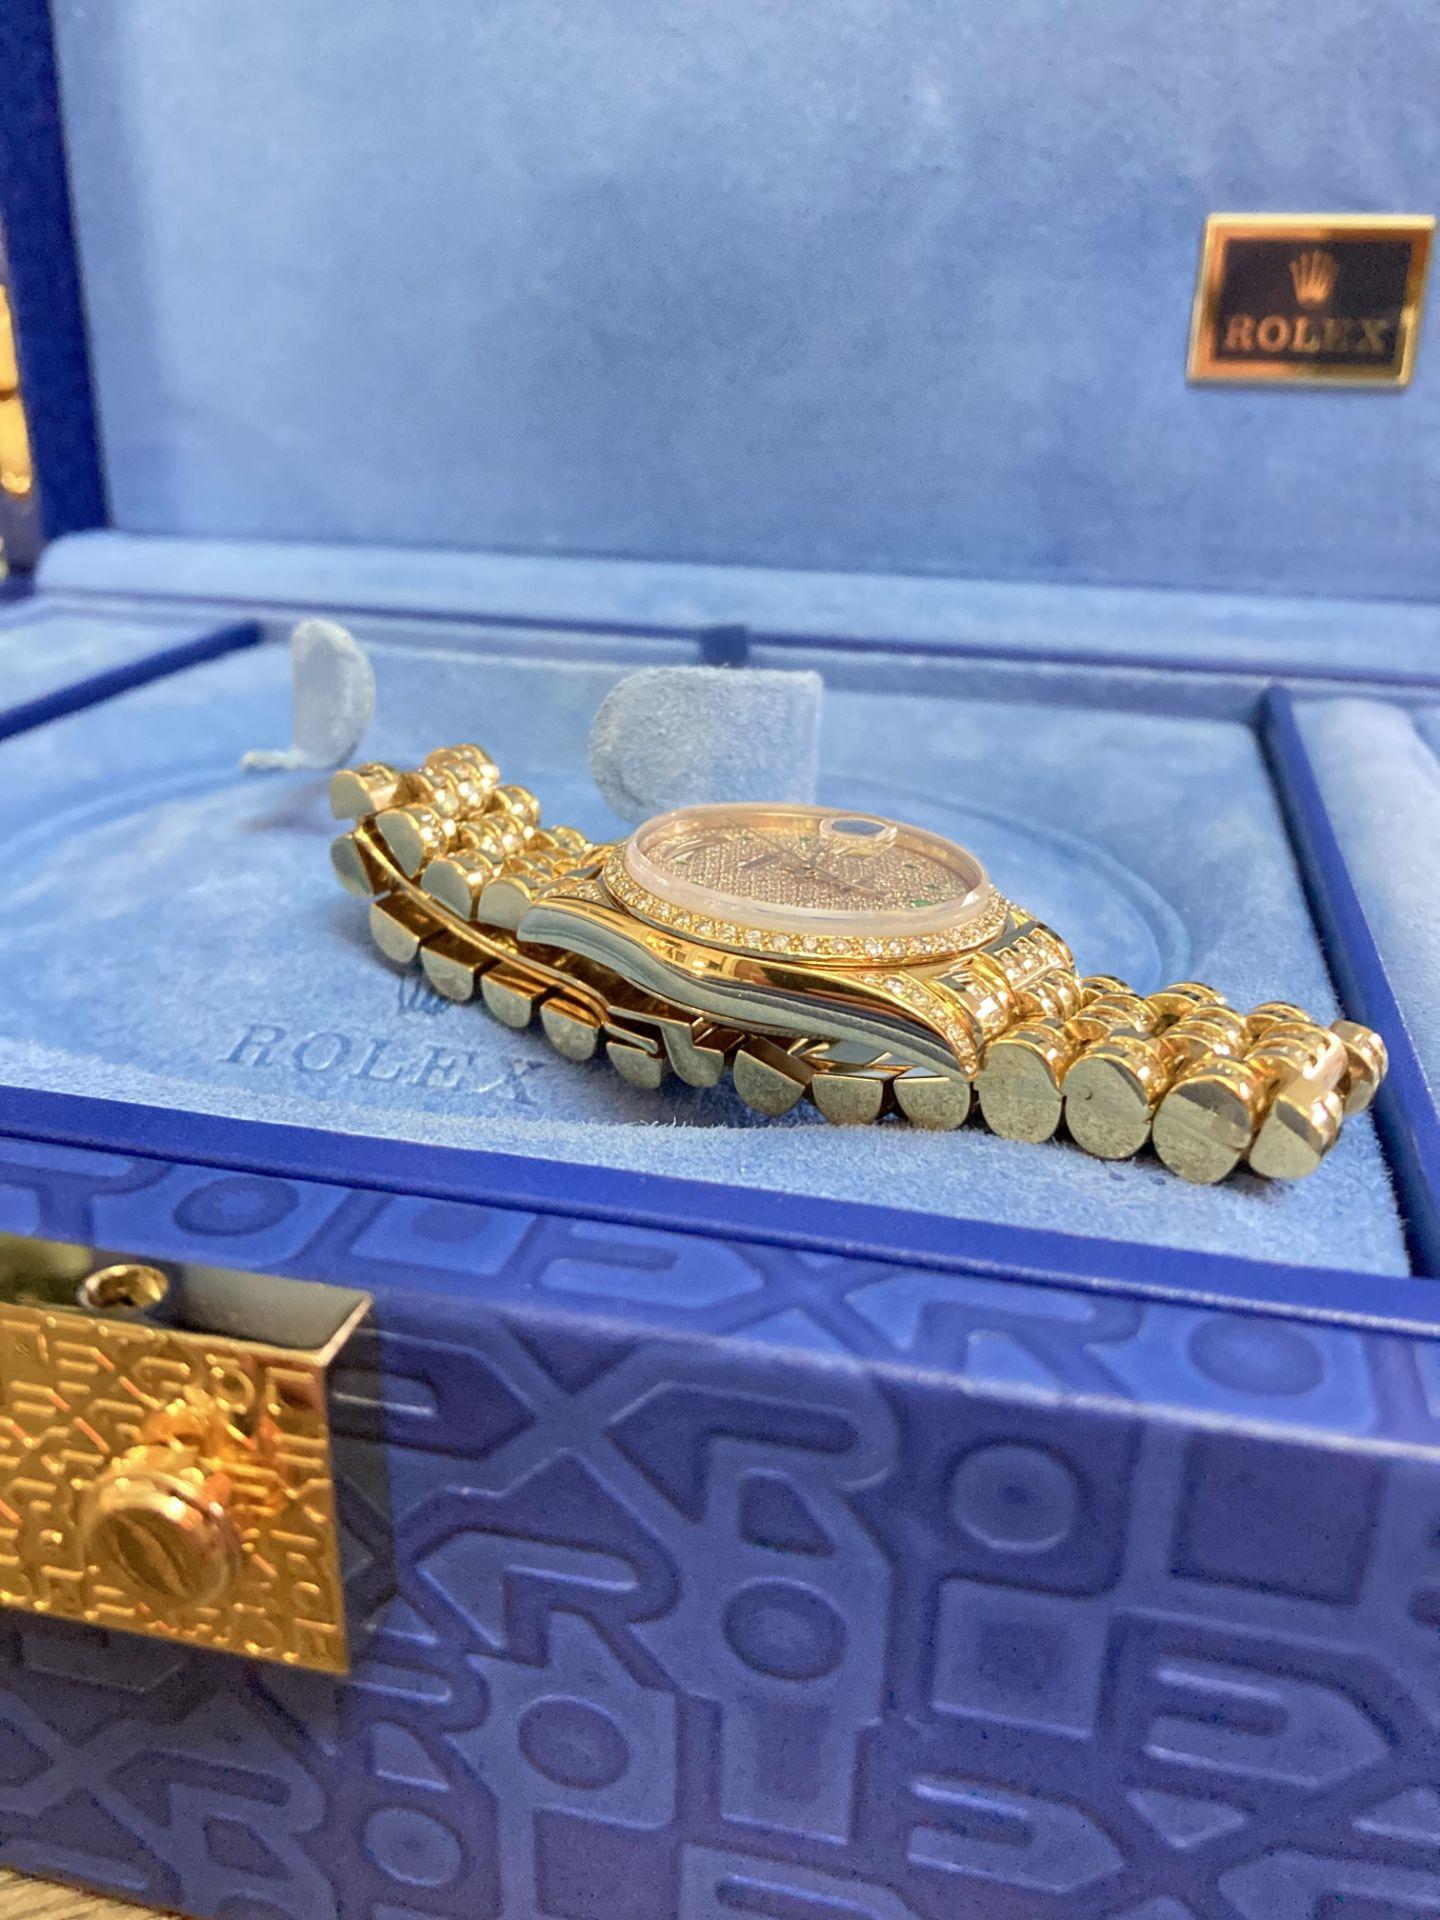 GENTS 36mm ROLEX DAYDATE YELLOW GOLD DIAMOND WATCH - Image 15 of 21